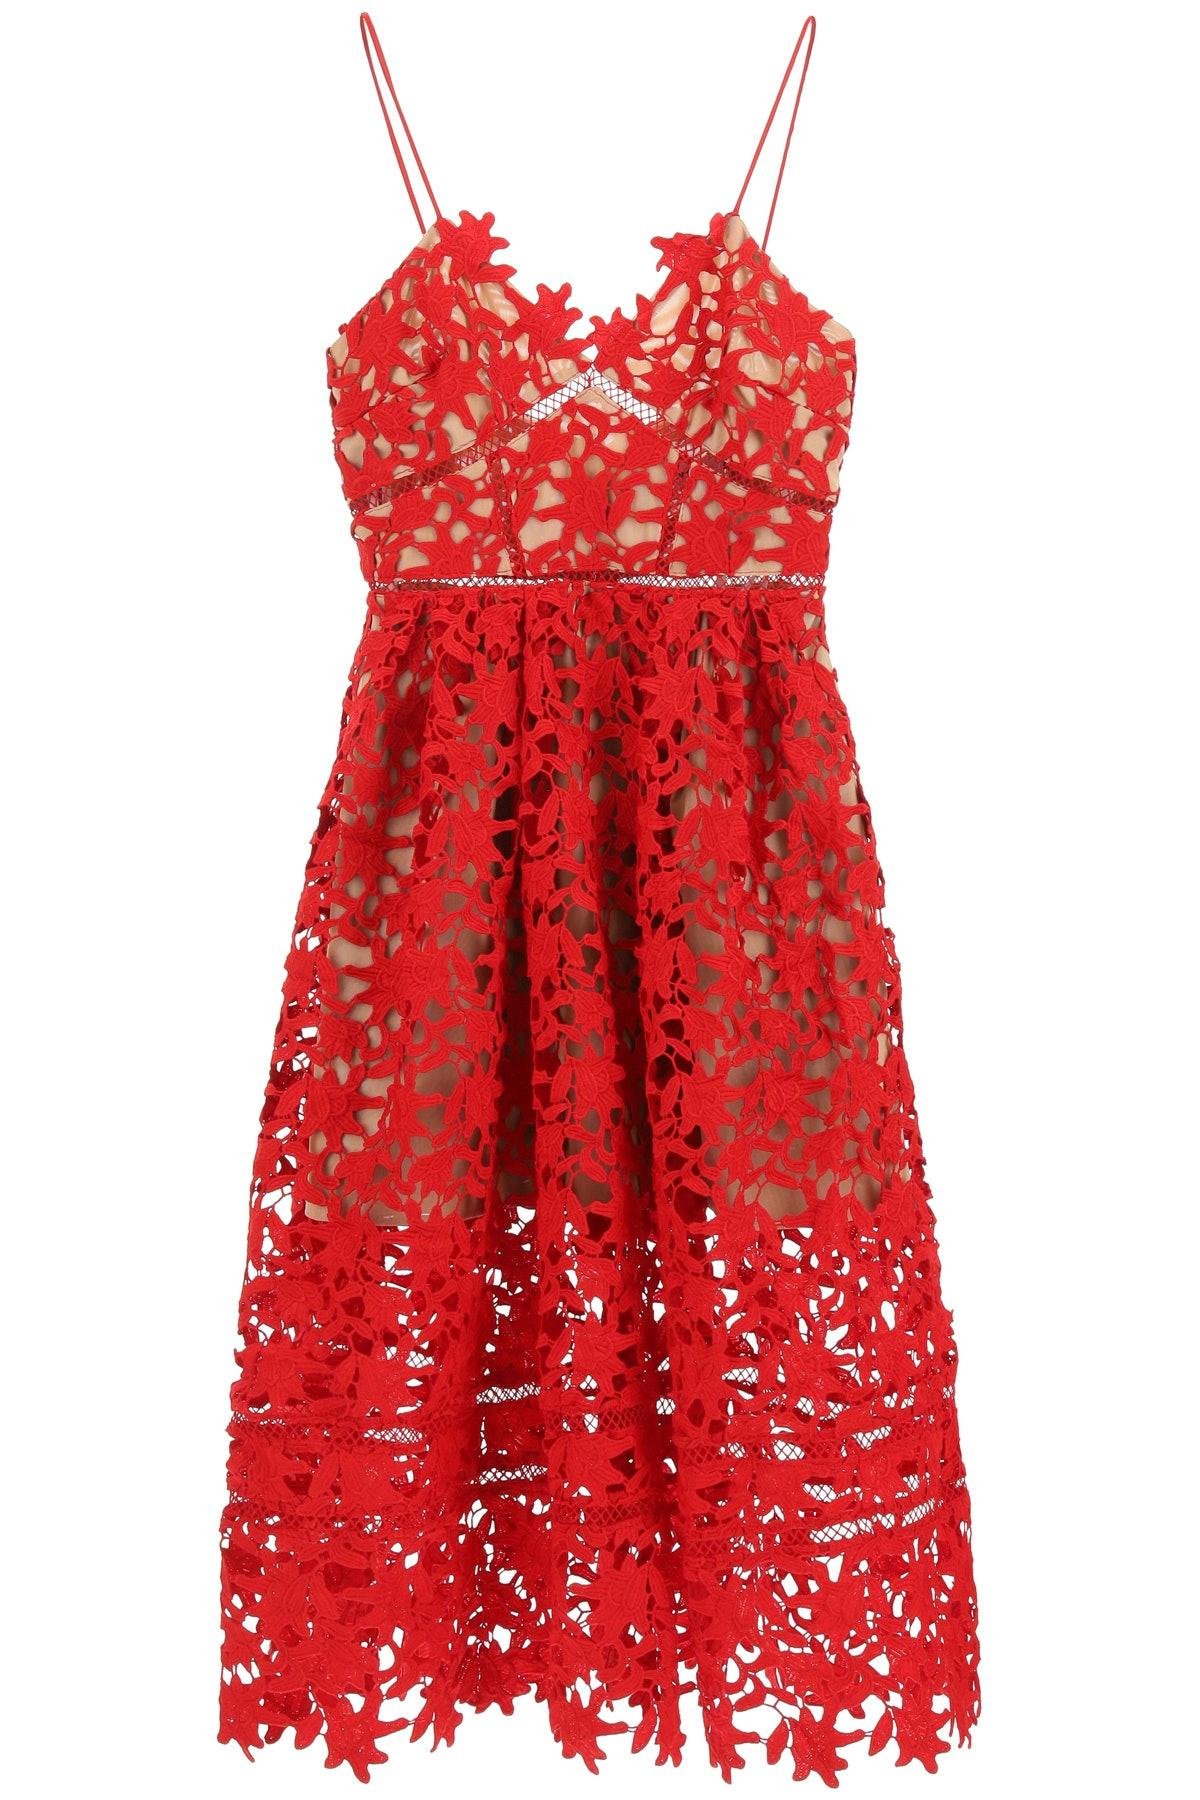 Self Portrait's Azaela red laced midi dress.